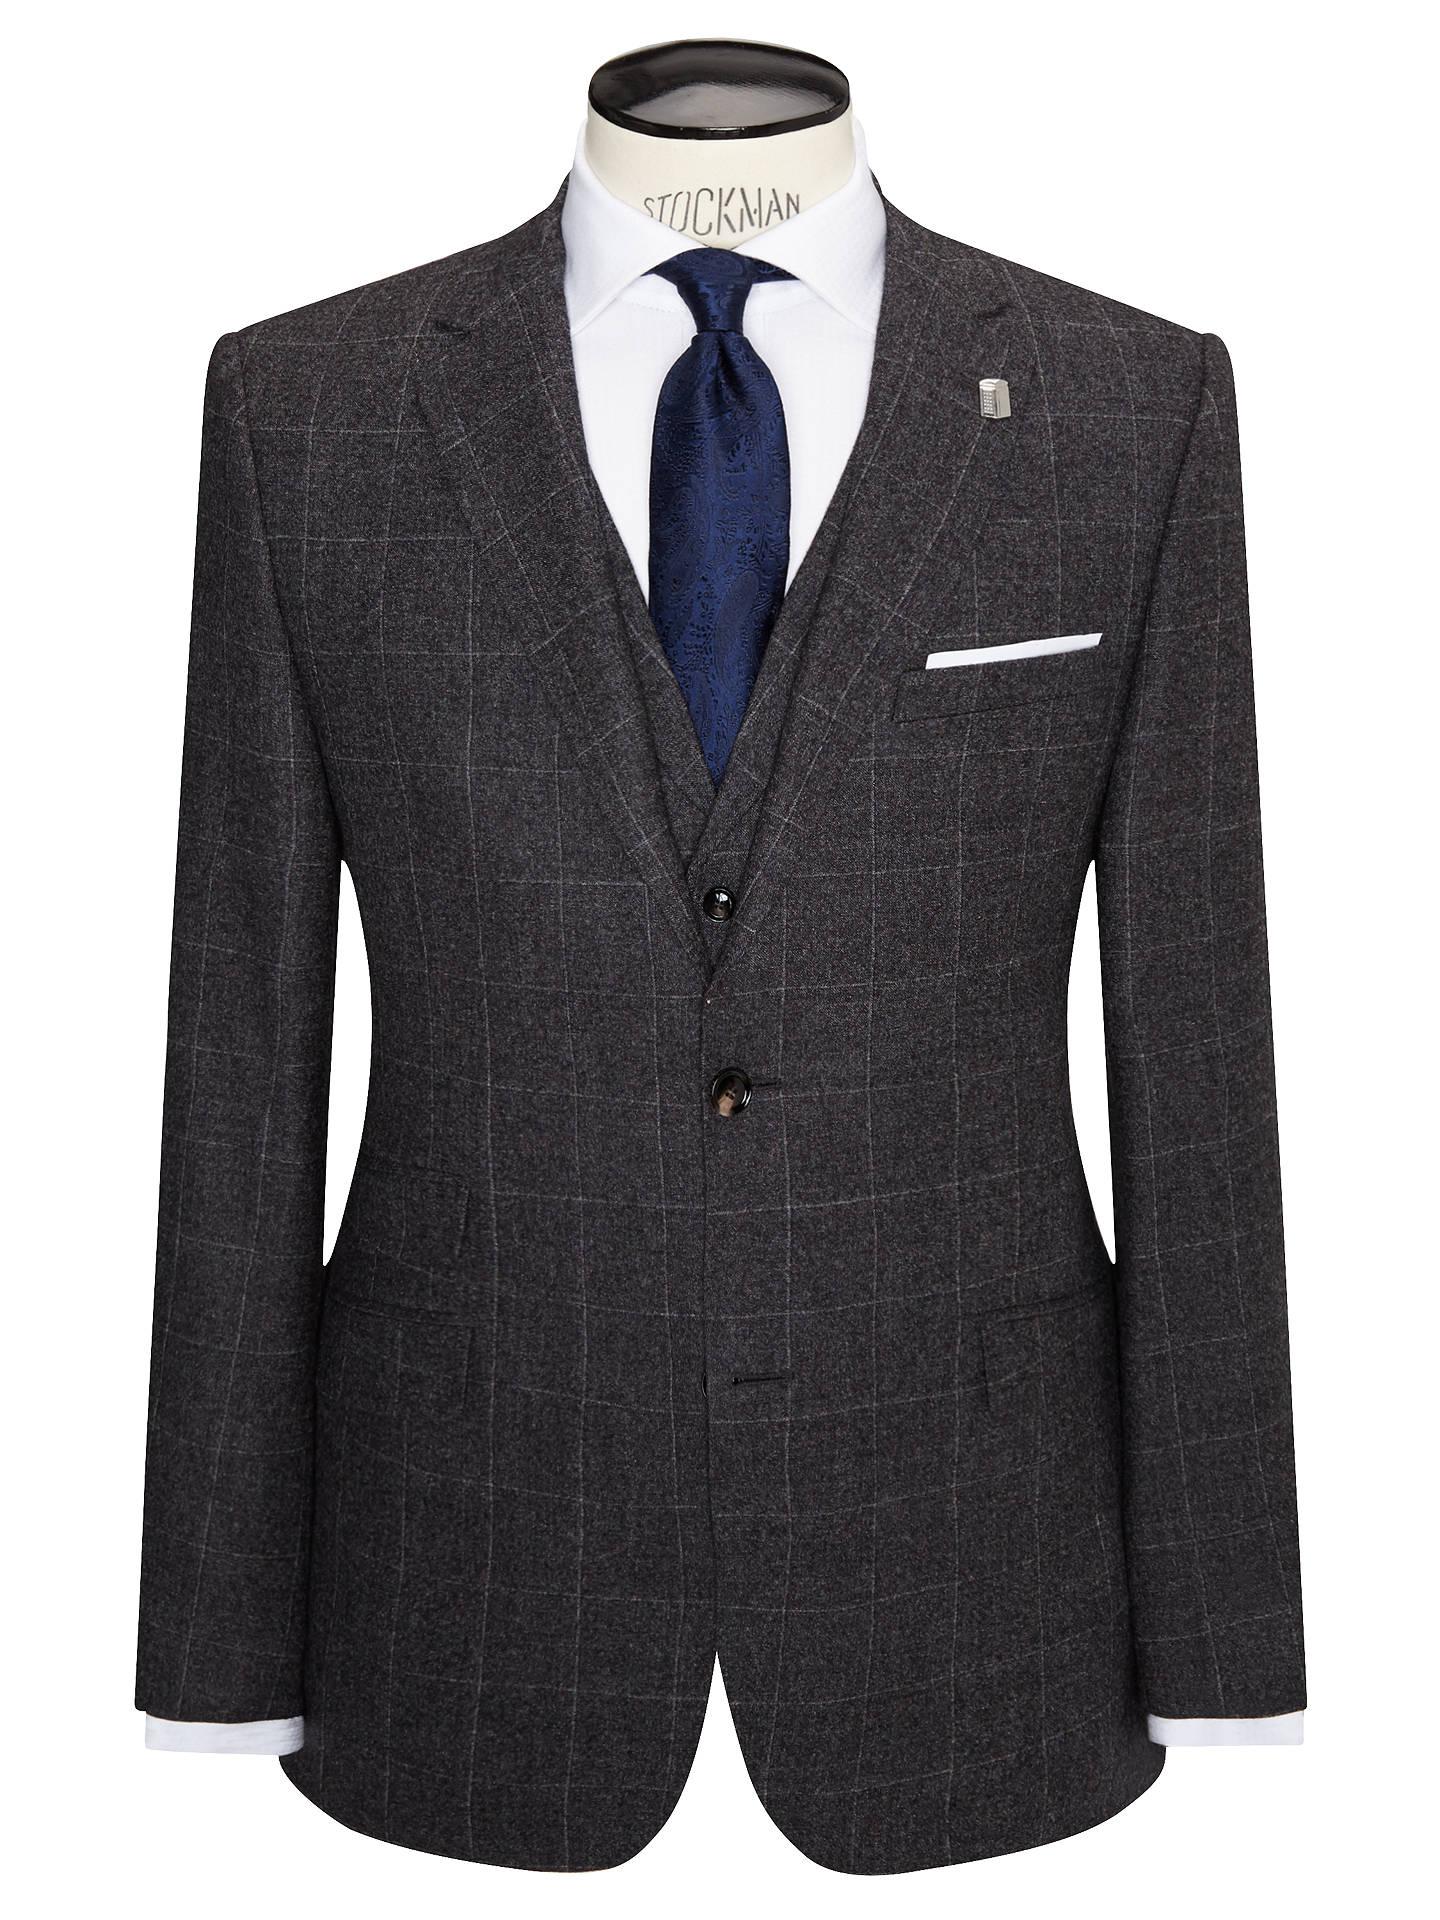 671abfbcb5581e BuyTed Baker Maltez Melange Windowpane Regular Fit Suit Jacket